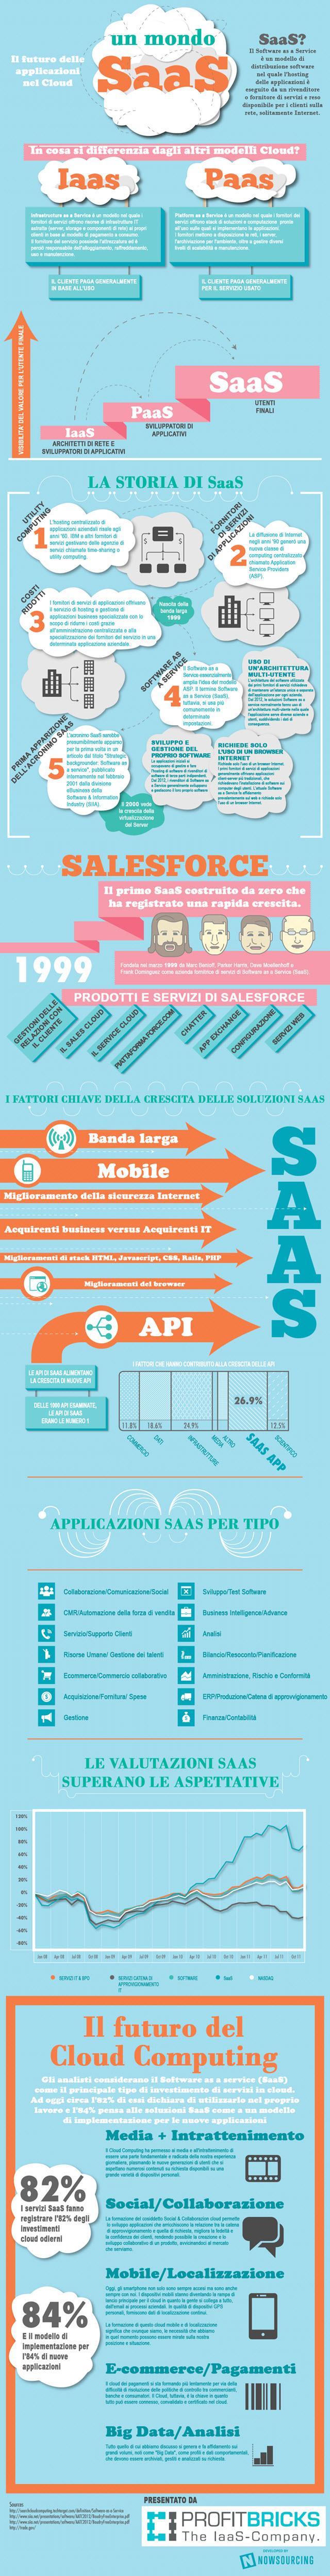 infografica sul SaaS